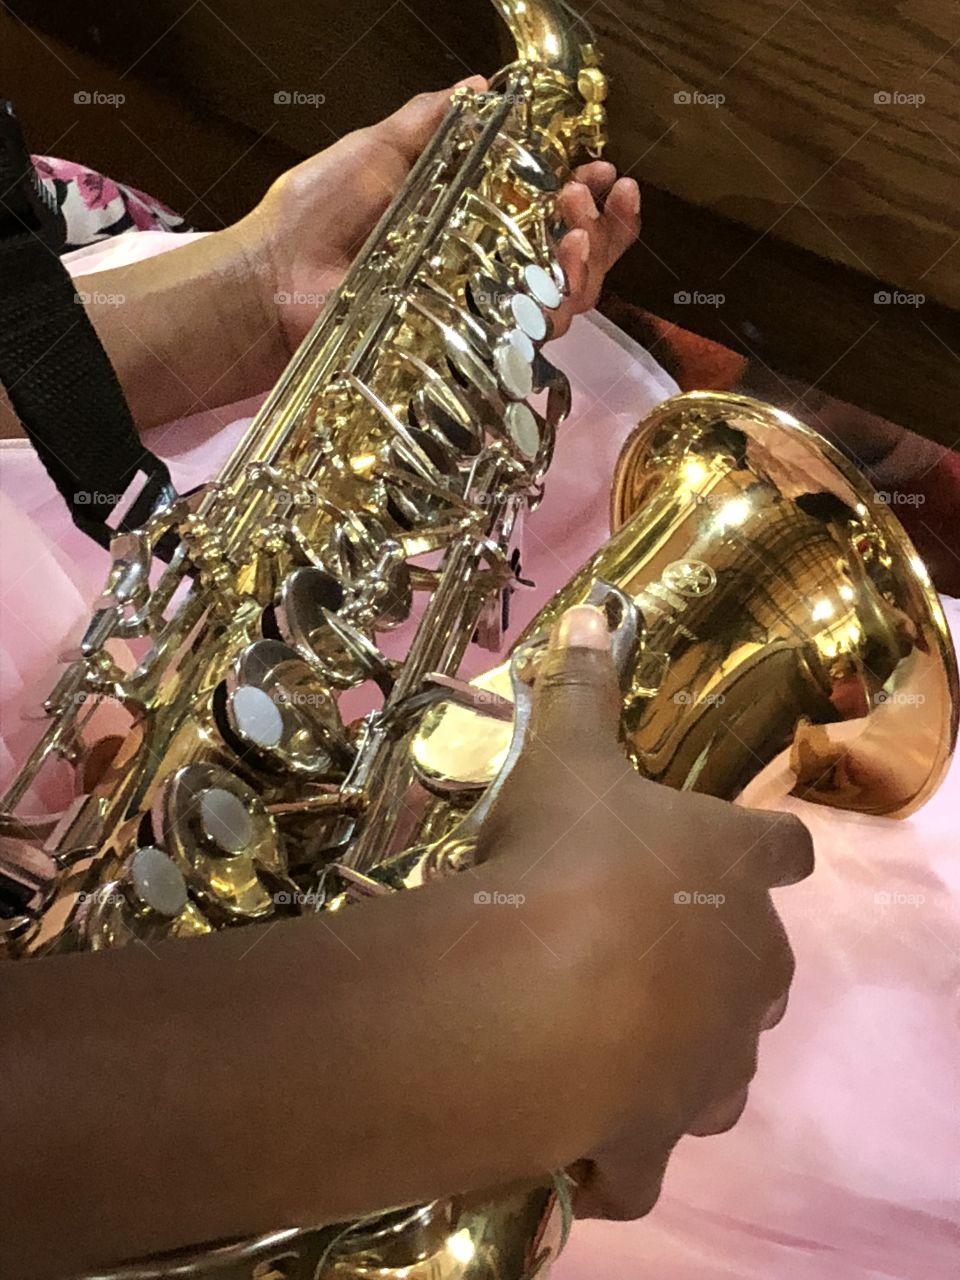 Saxophone in hand